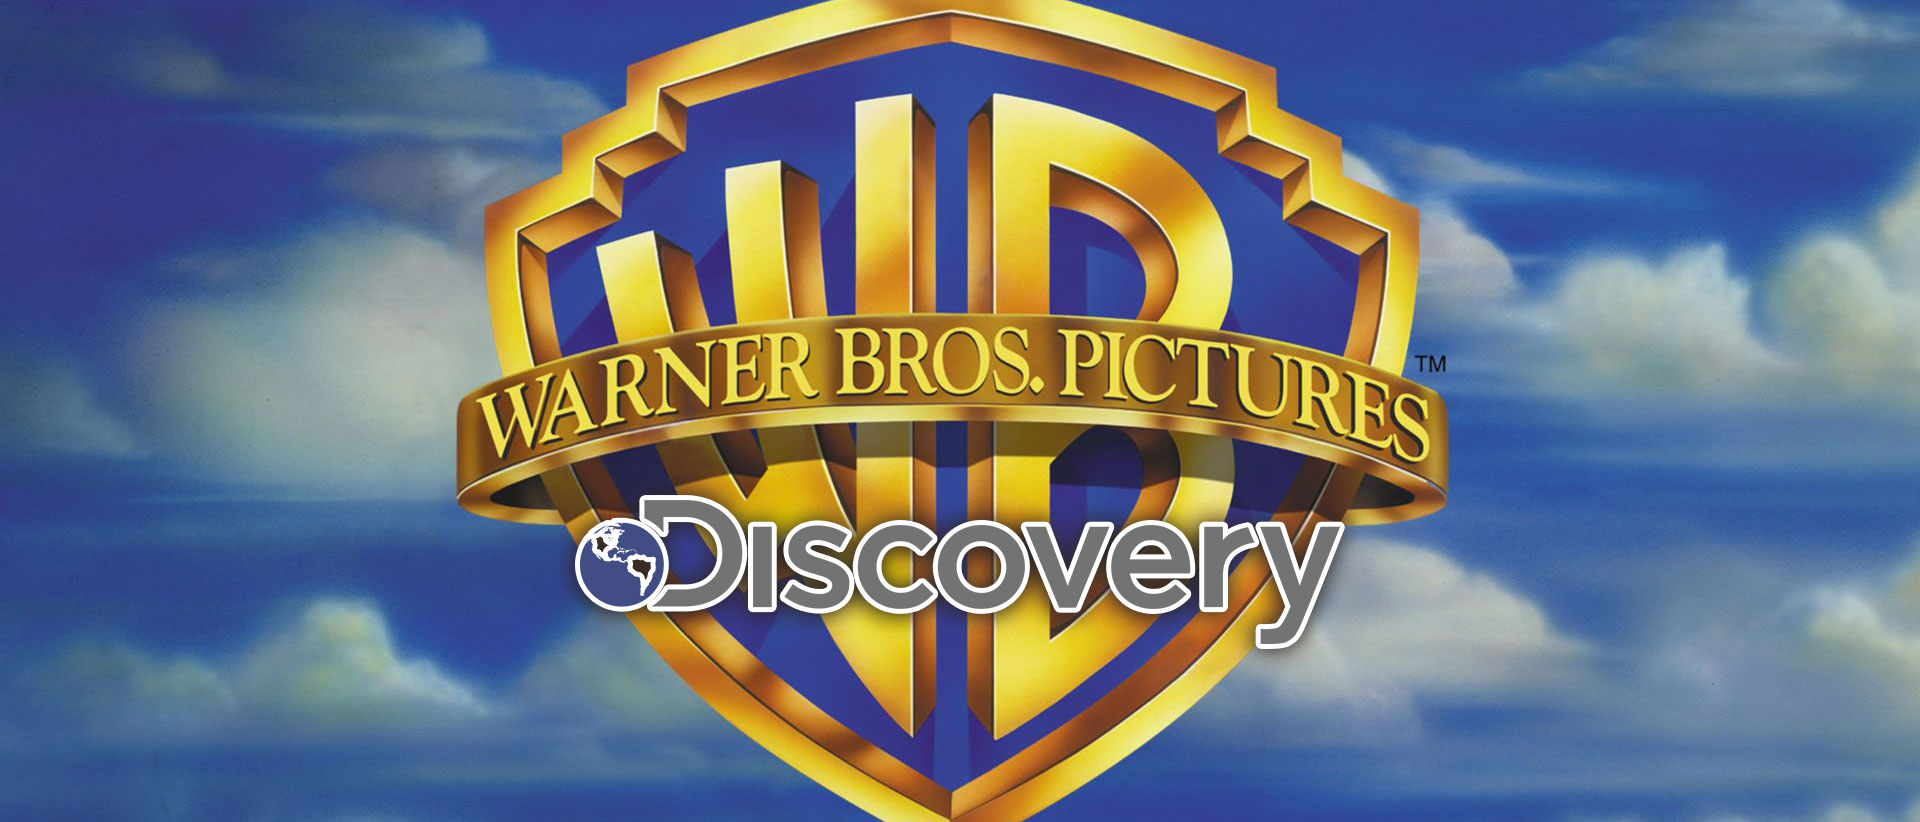 WarnerMedia-Discovery-Warner-Bros